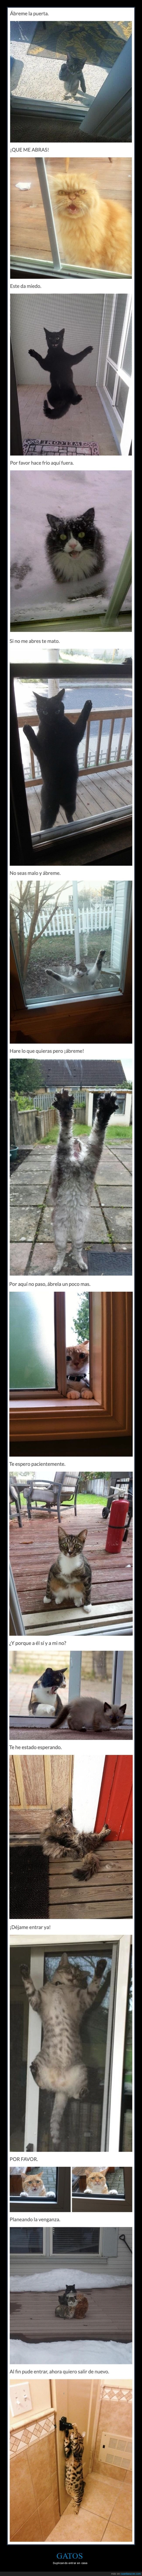 abrir,entrar,gatos,puertas